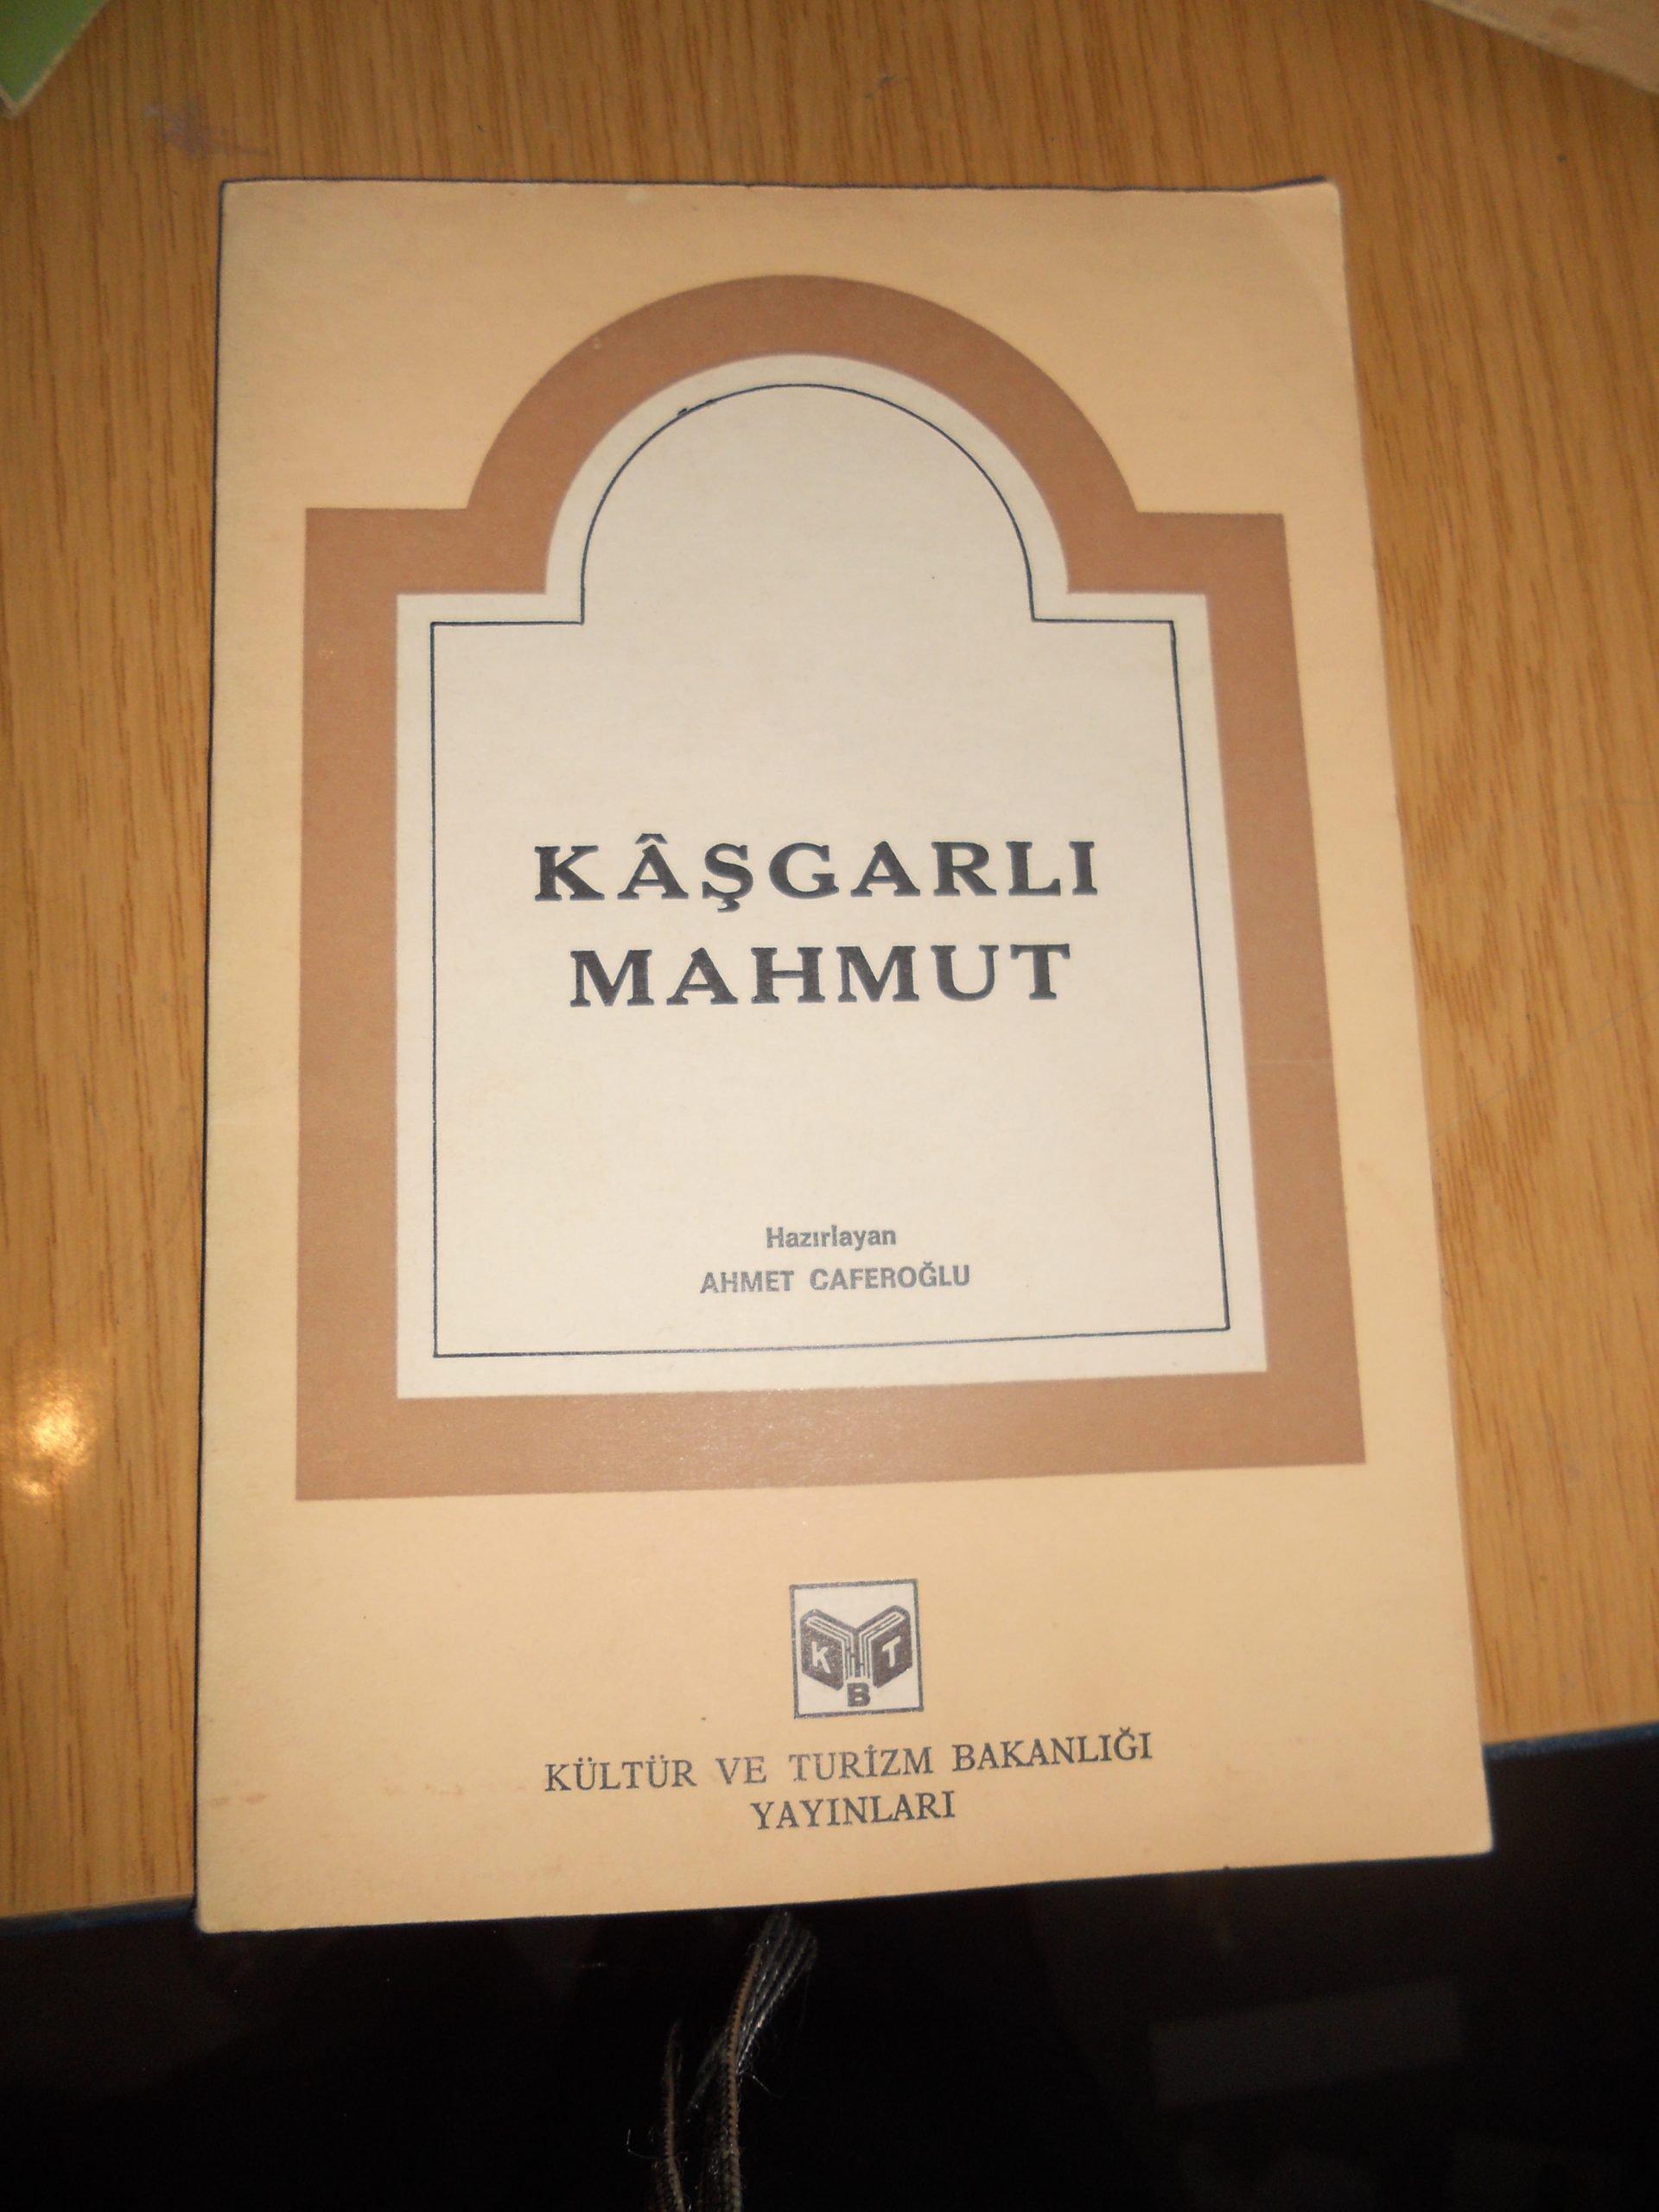 KAŞGARLI MAHMUT/Ahmet Caferoğlu/10 tl